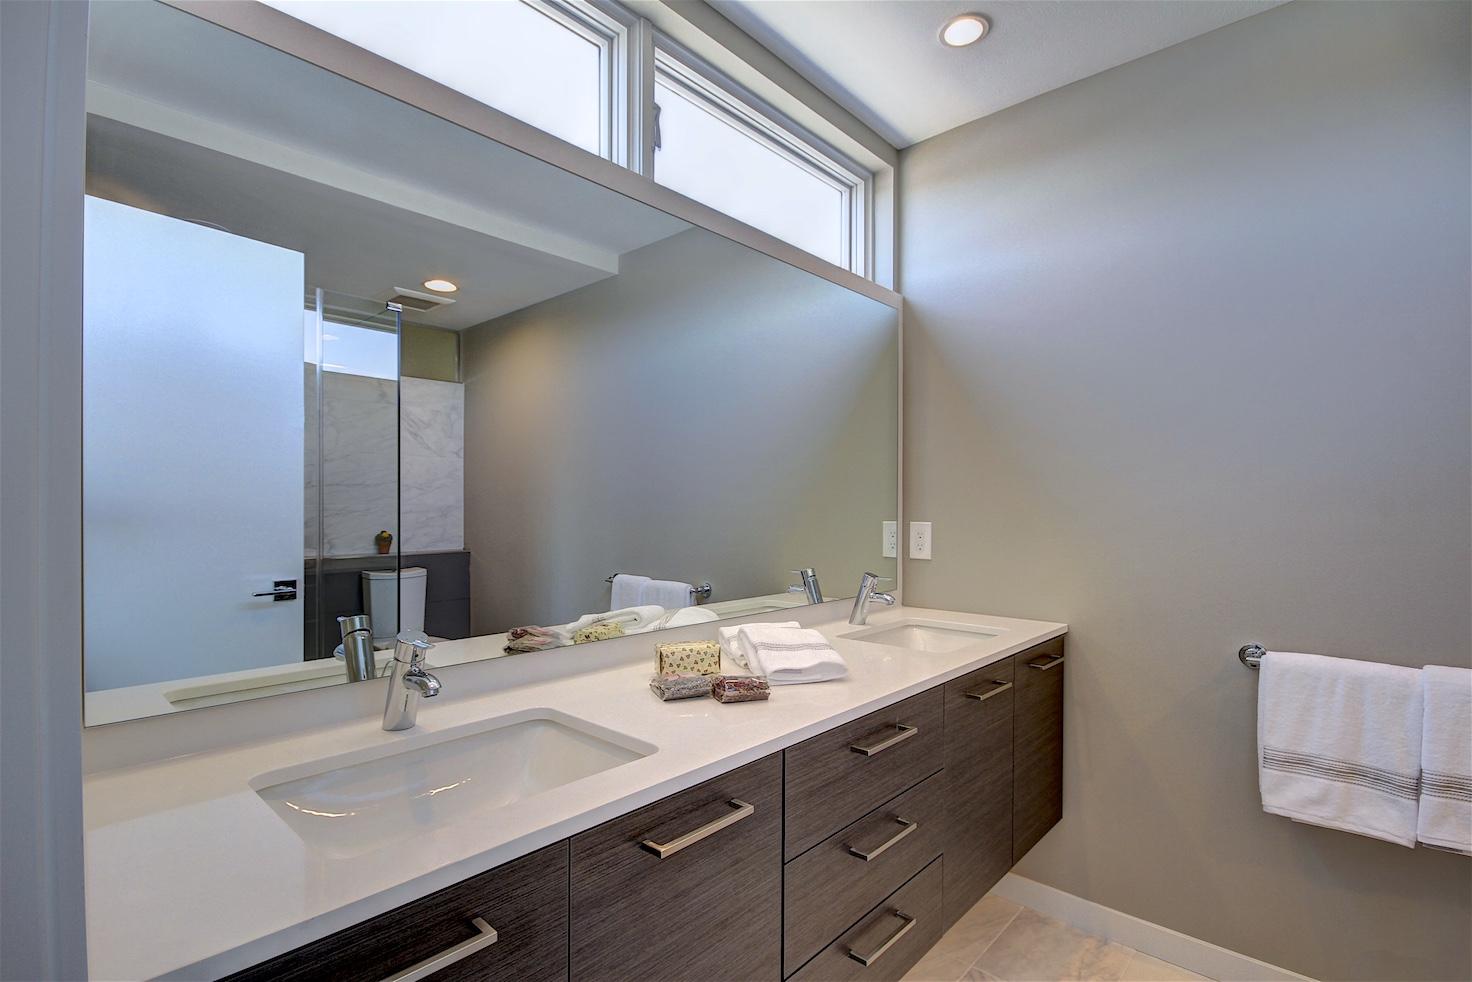 master-bathroom_justincampbellcle_realtor_216-801-3599.jpg